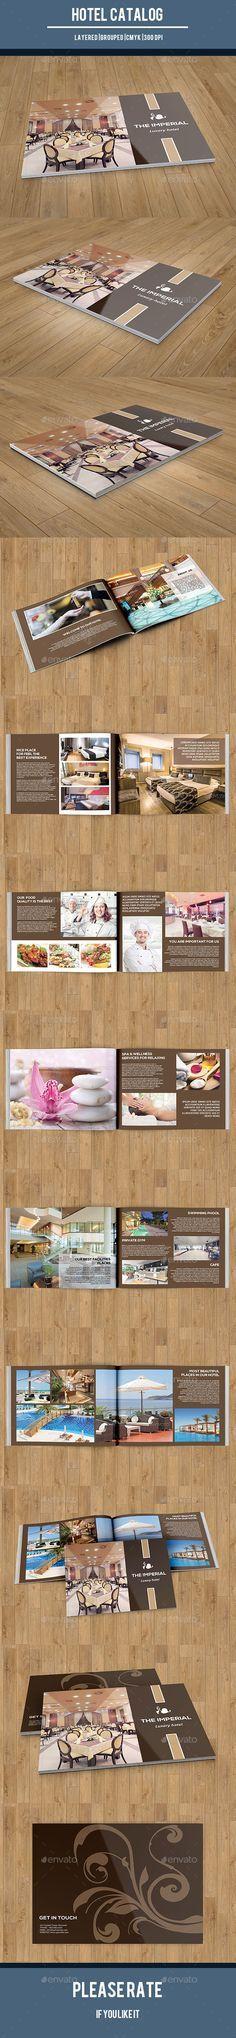 Elegance Hotel Brochure Modern Elegance Brochure Template For